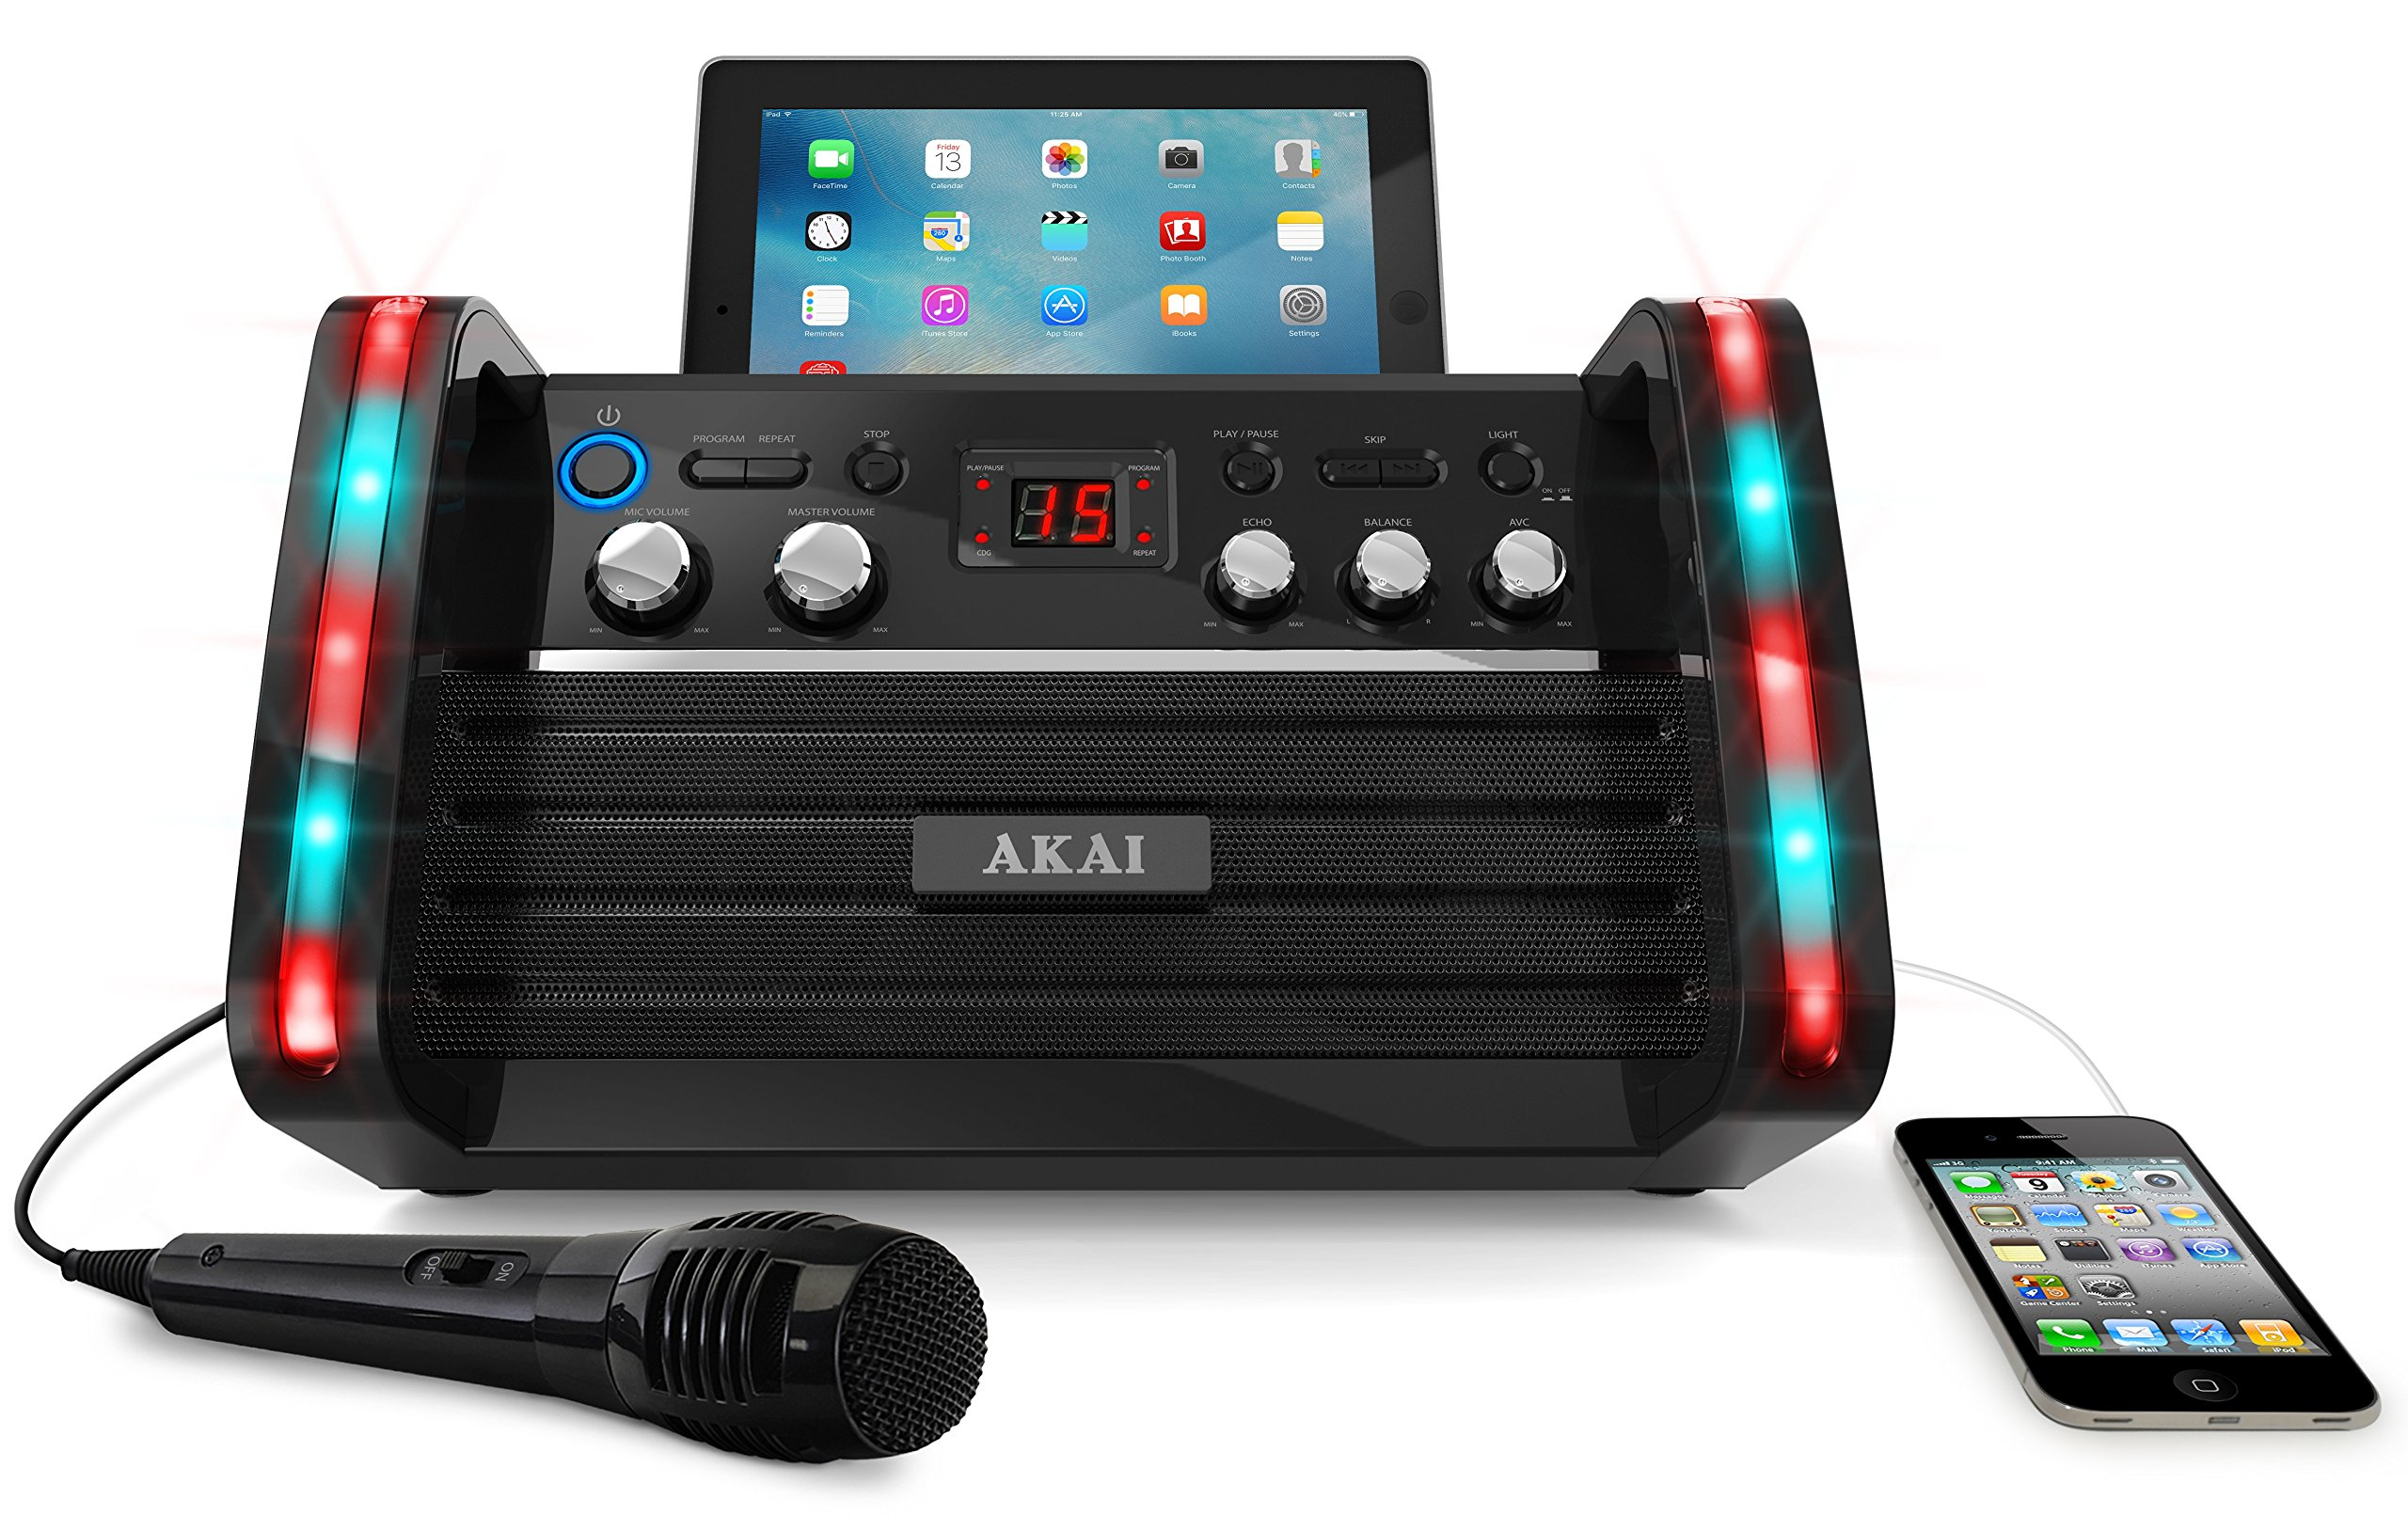 Akai KS213 Portable CD&G Karaoke System with Tablet Cradle